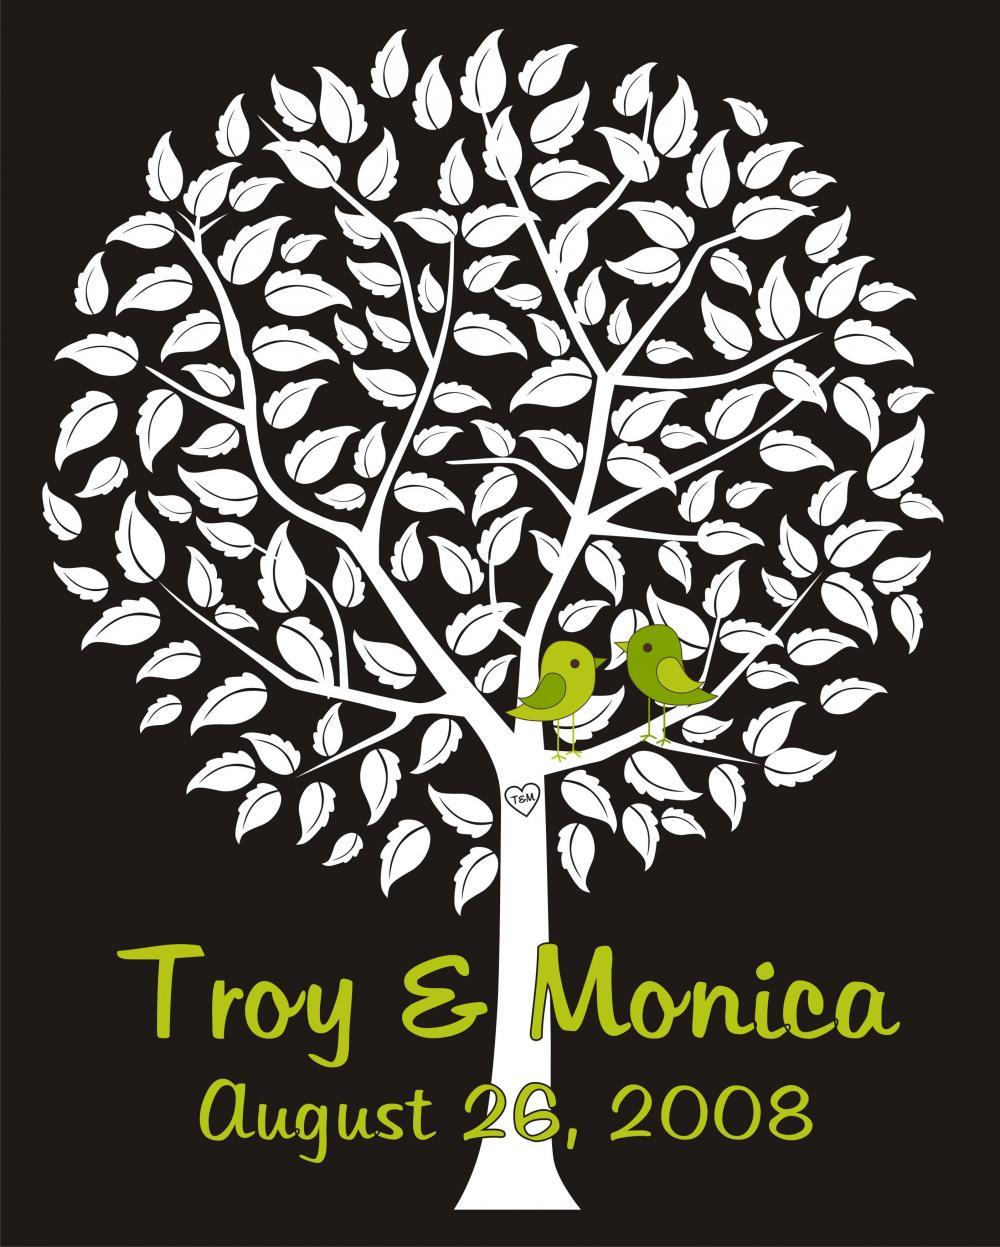 Personalized wedding signature tree, 16x20 100 signatures guest book alternative, wedding fingerprint tree